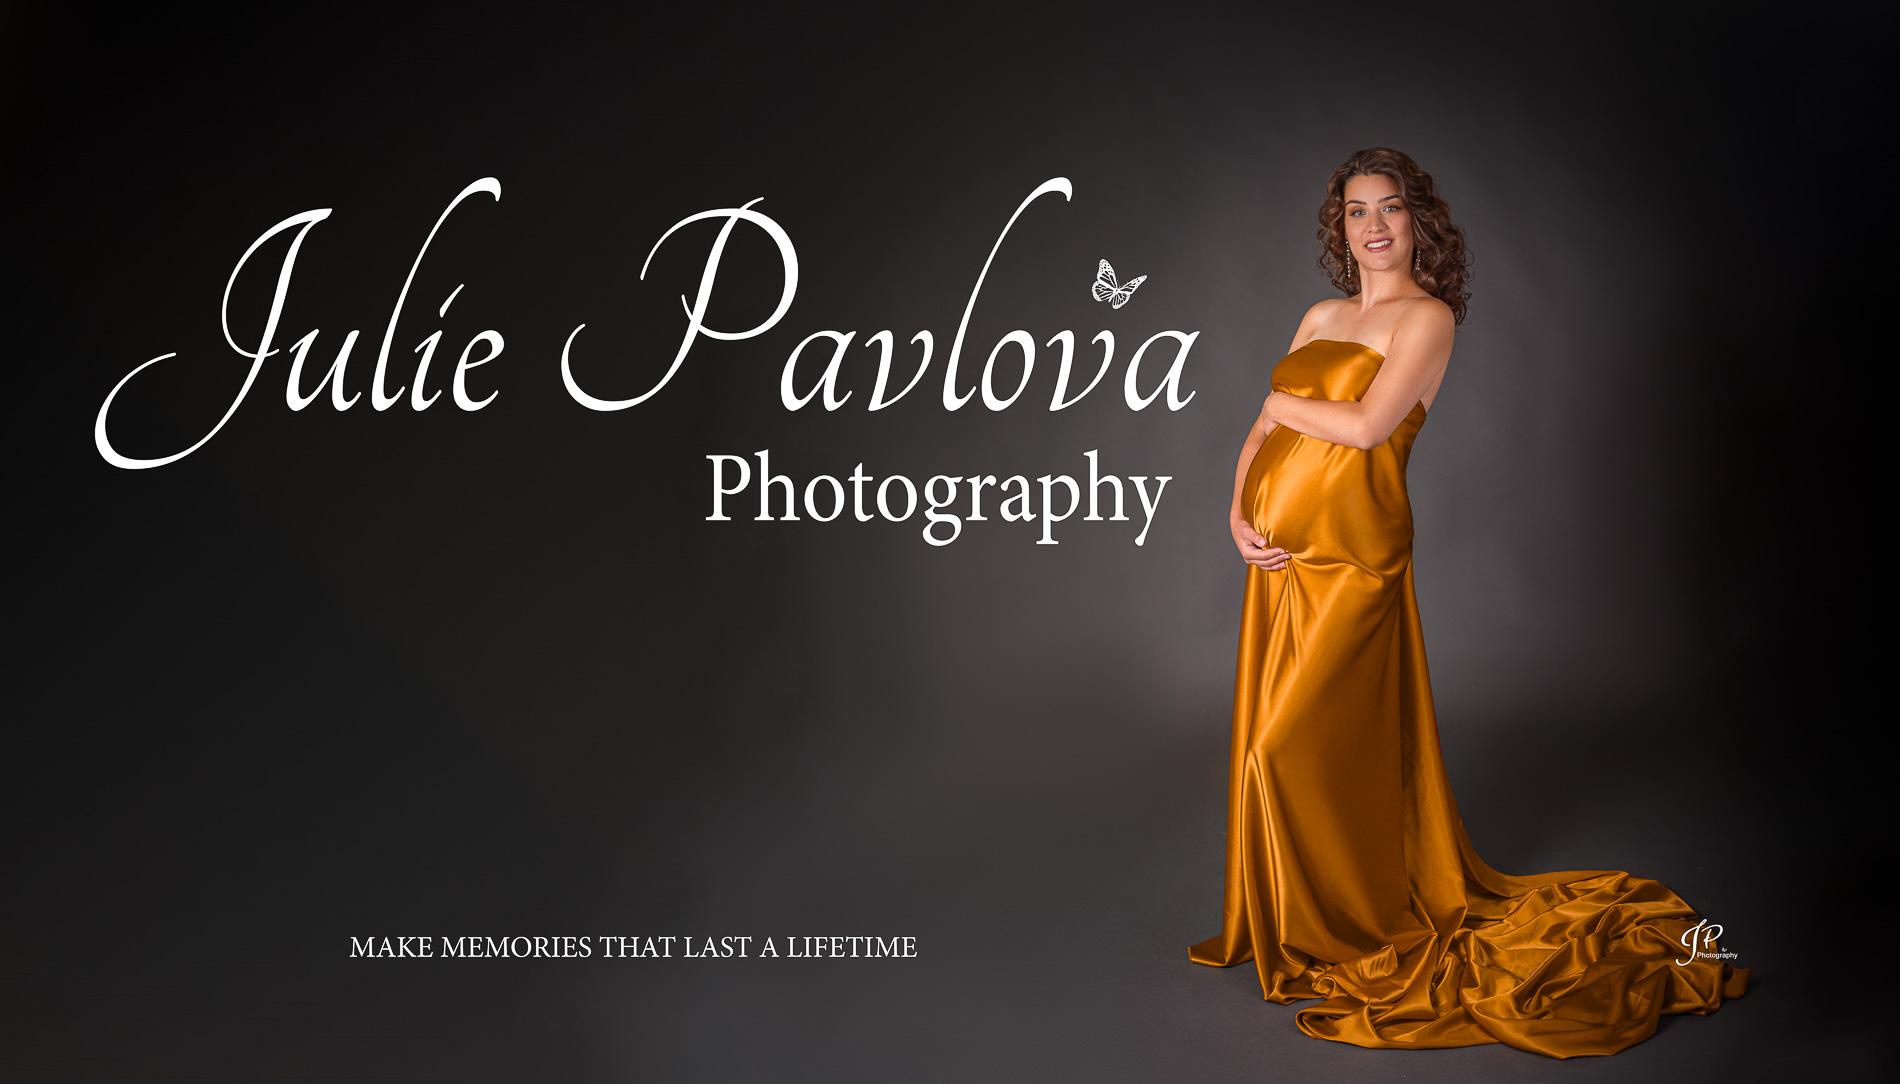 Fine Art Glamour Maternity Portrait by New Jersey professional photographer Julie Pavlova Photography, top 20 Best New York Photographers (Bergen County, NJ)